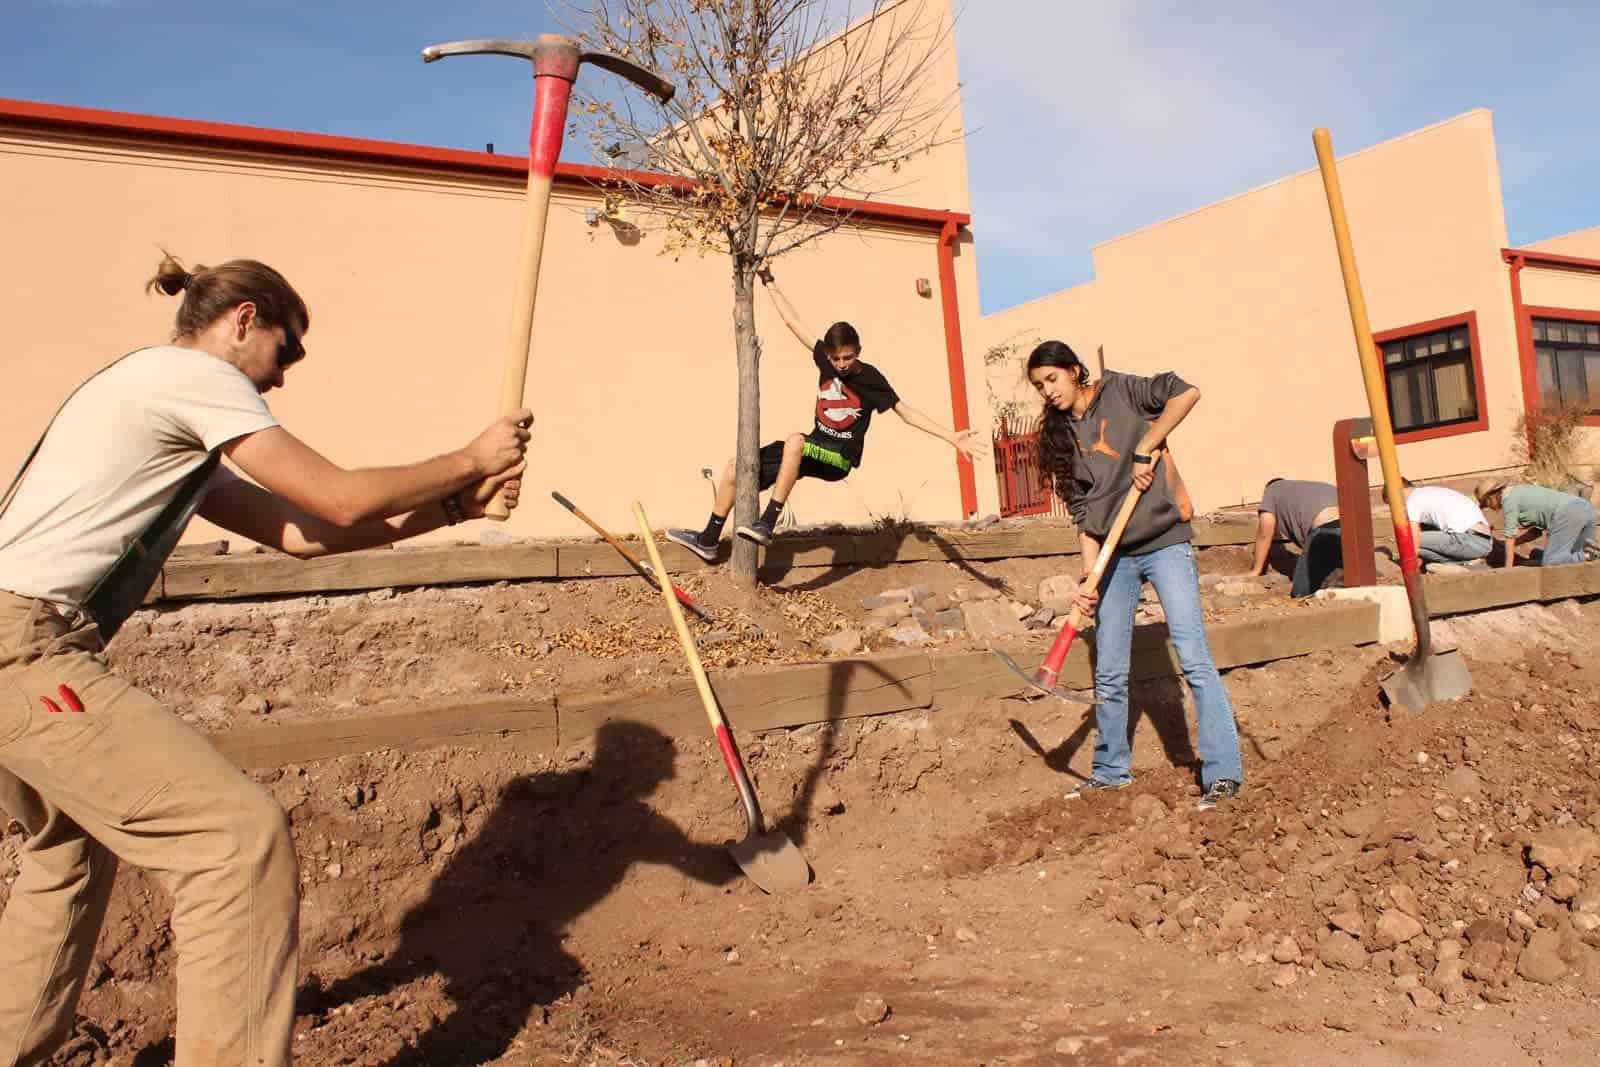 Caleb Weaver of Borderlands Restoration  works with Patagonia Union High School students in Santa Cruz, Arizona, to dig terraces before installing pollinator plants at the school's pollinator garden.